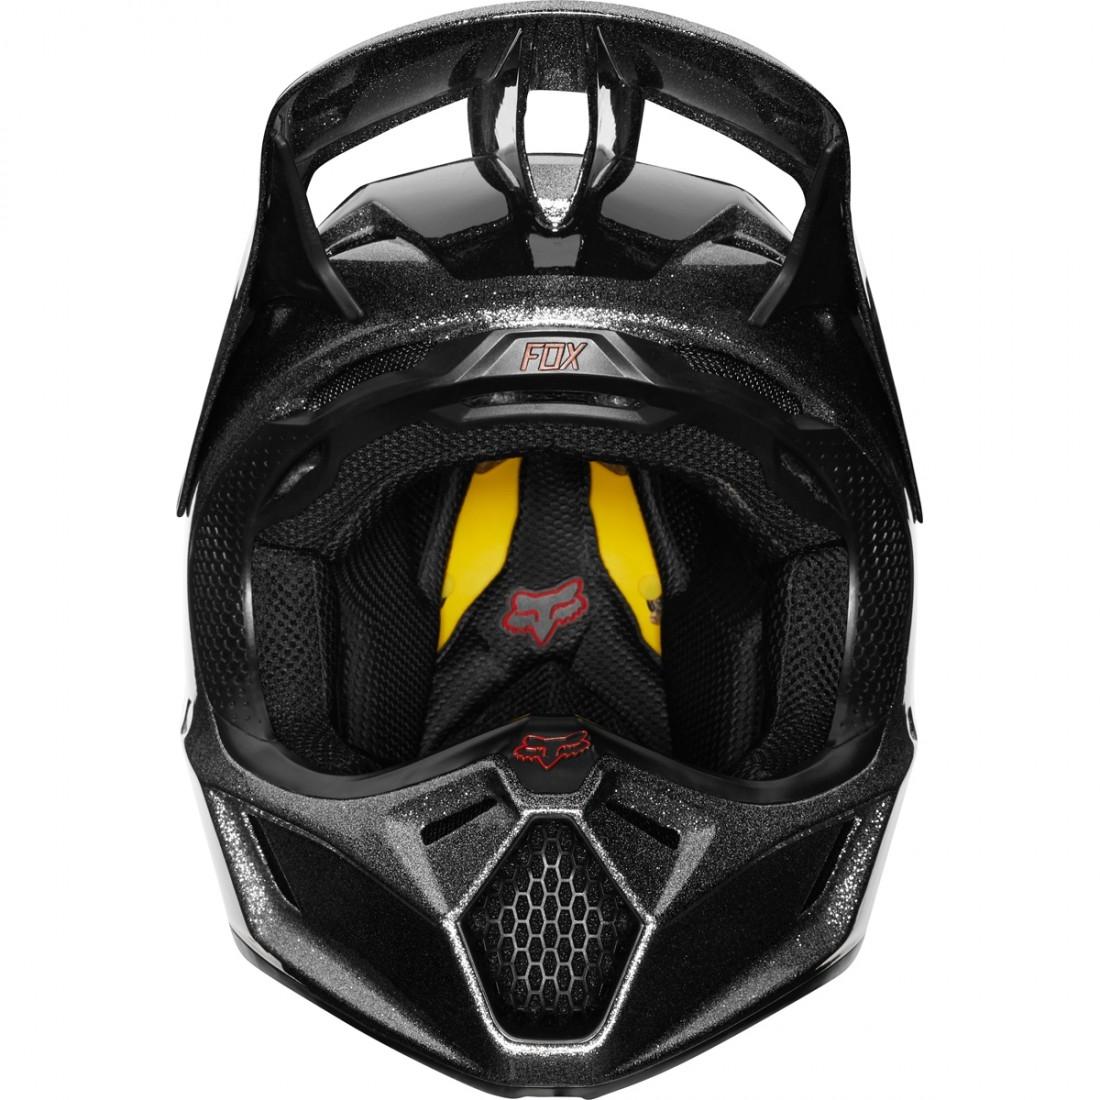 936a4025 FOX V3 Baz 2019 Pewter Helmet · Motocard